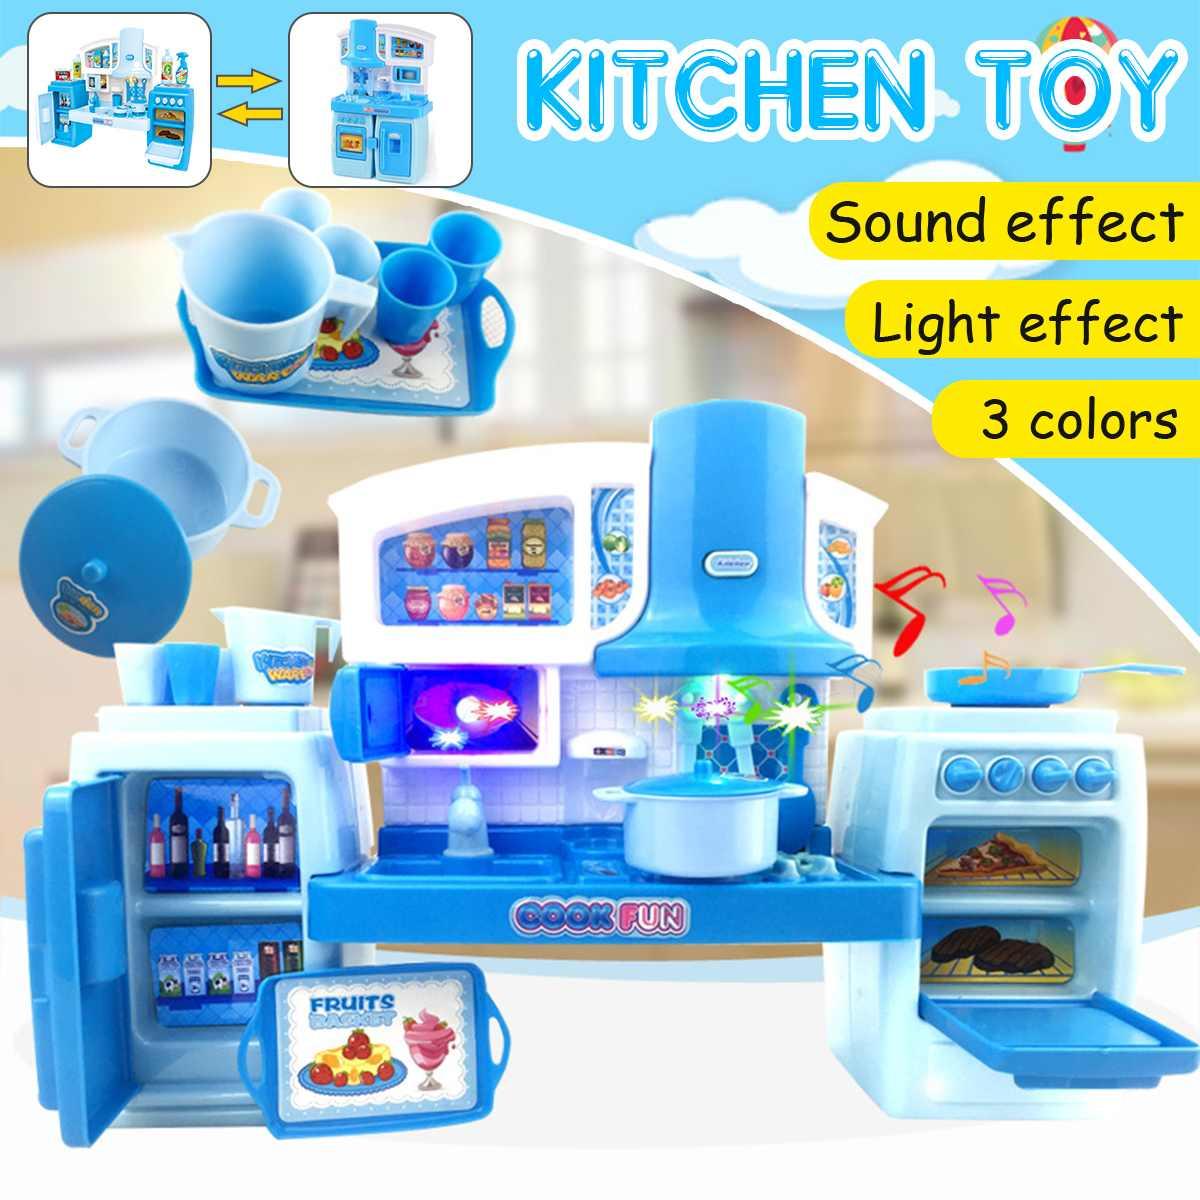 Funny Kids Kitchen Toy Simulation Kitchen Toy Light/Music Effect Dinnerware Pretend Play Kitchen Cooking Table Set Children Gift